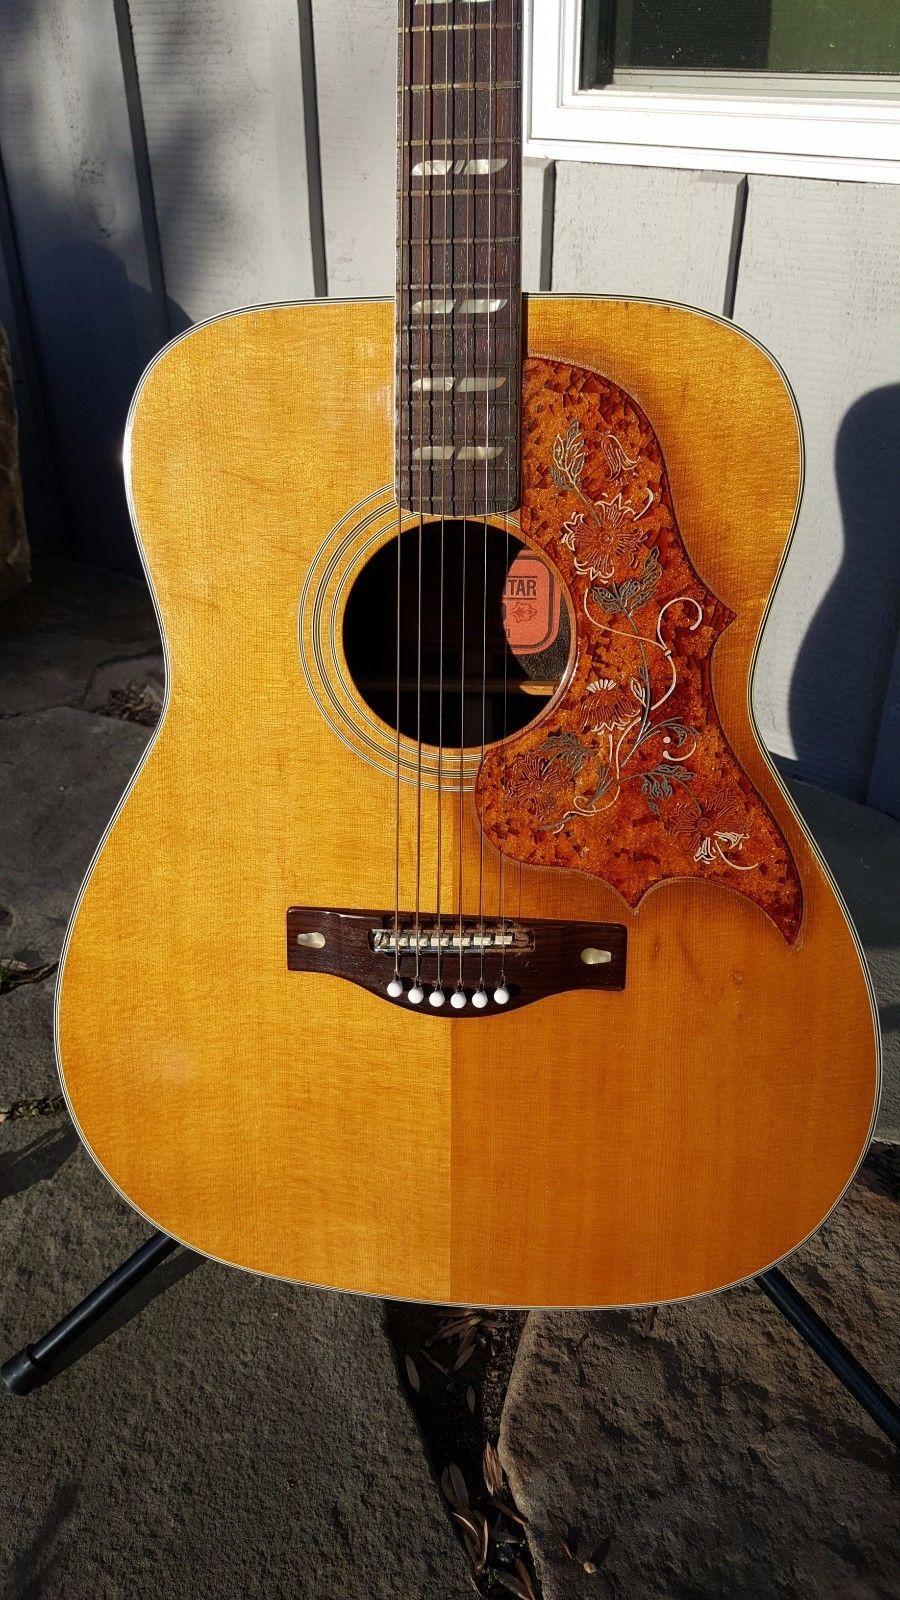 Yamaha Fg 300 Vintage Acoustic Guitar 1970 Nippon Gakki Near Mint Condition Yamaha Guitar Guitar Acoustic Guitar